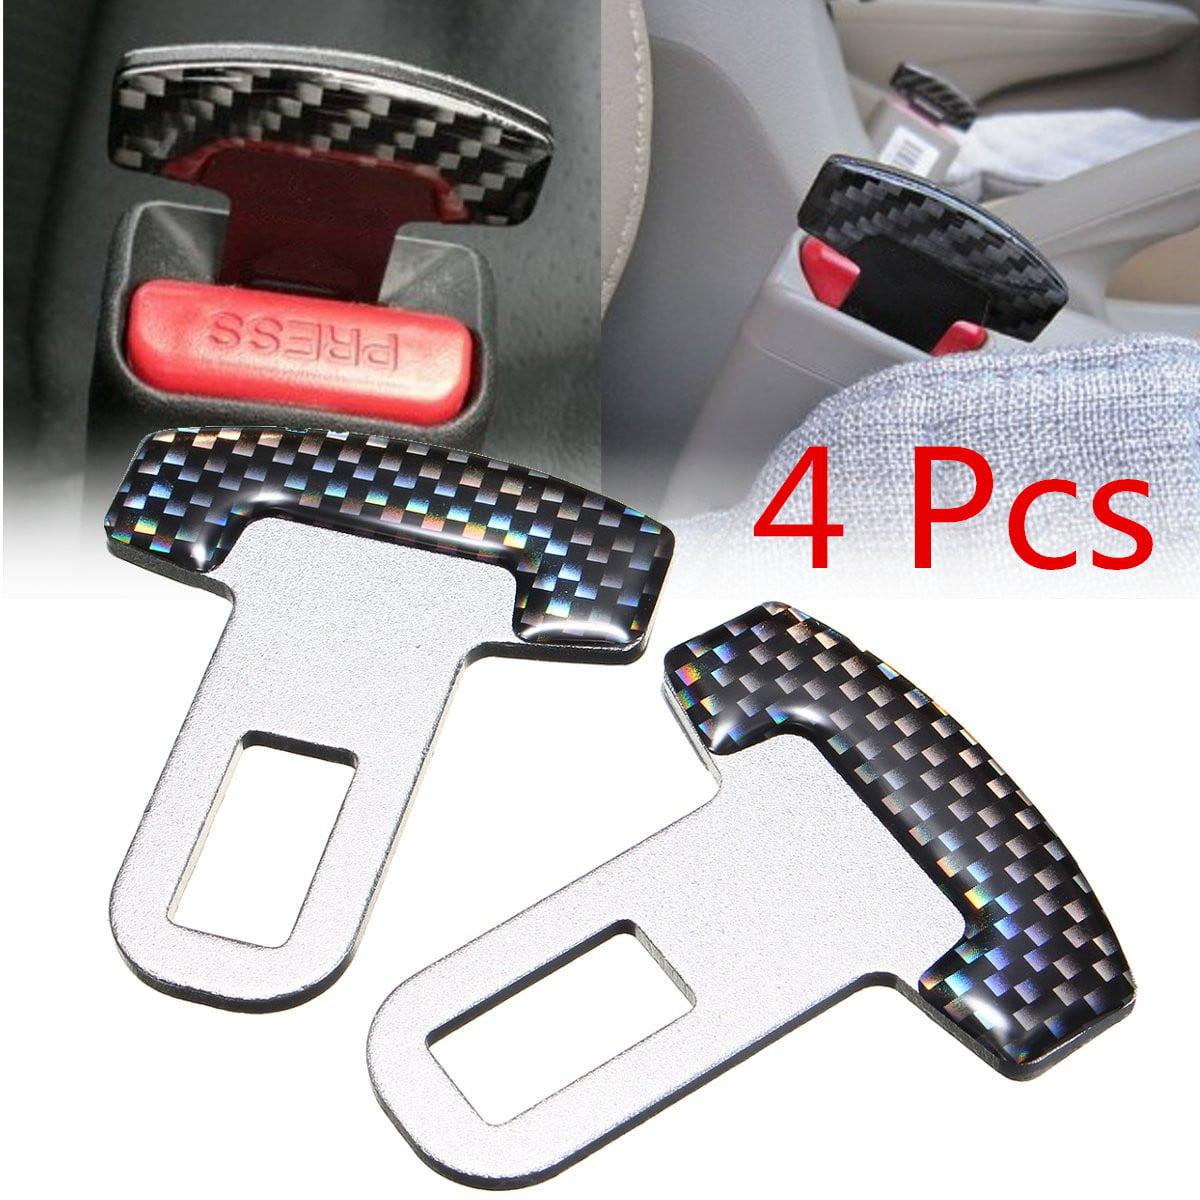 4x Car Safety Seat Belt Buckle Carbon Fiber Security Seatbelt Alarm Stopper Clip Clamp Aluminum Universal Auto Vehicle SUV